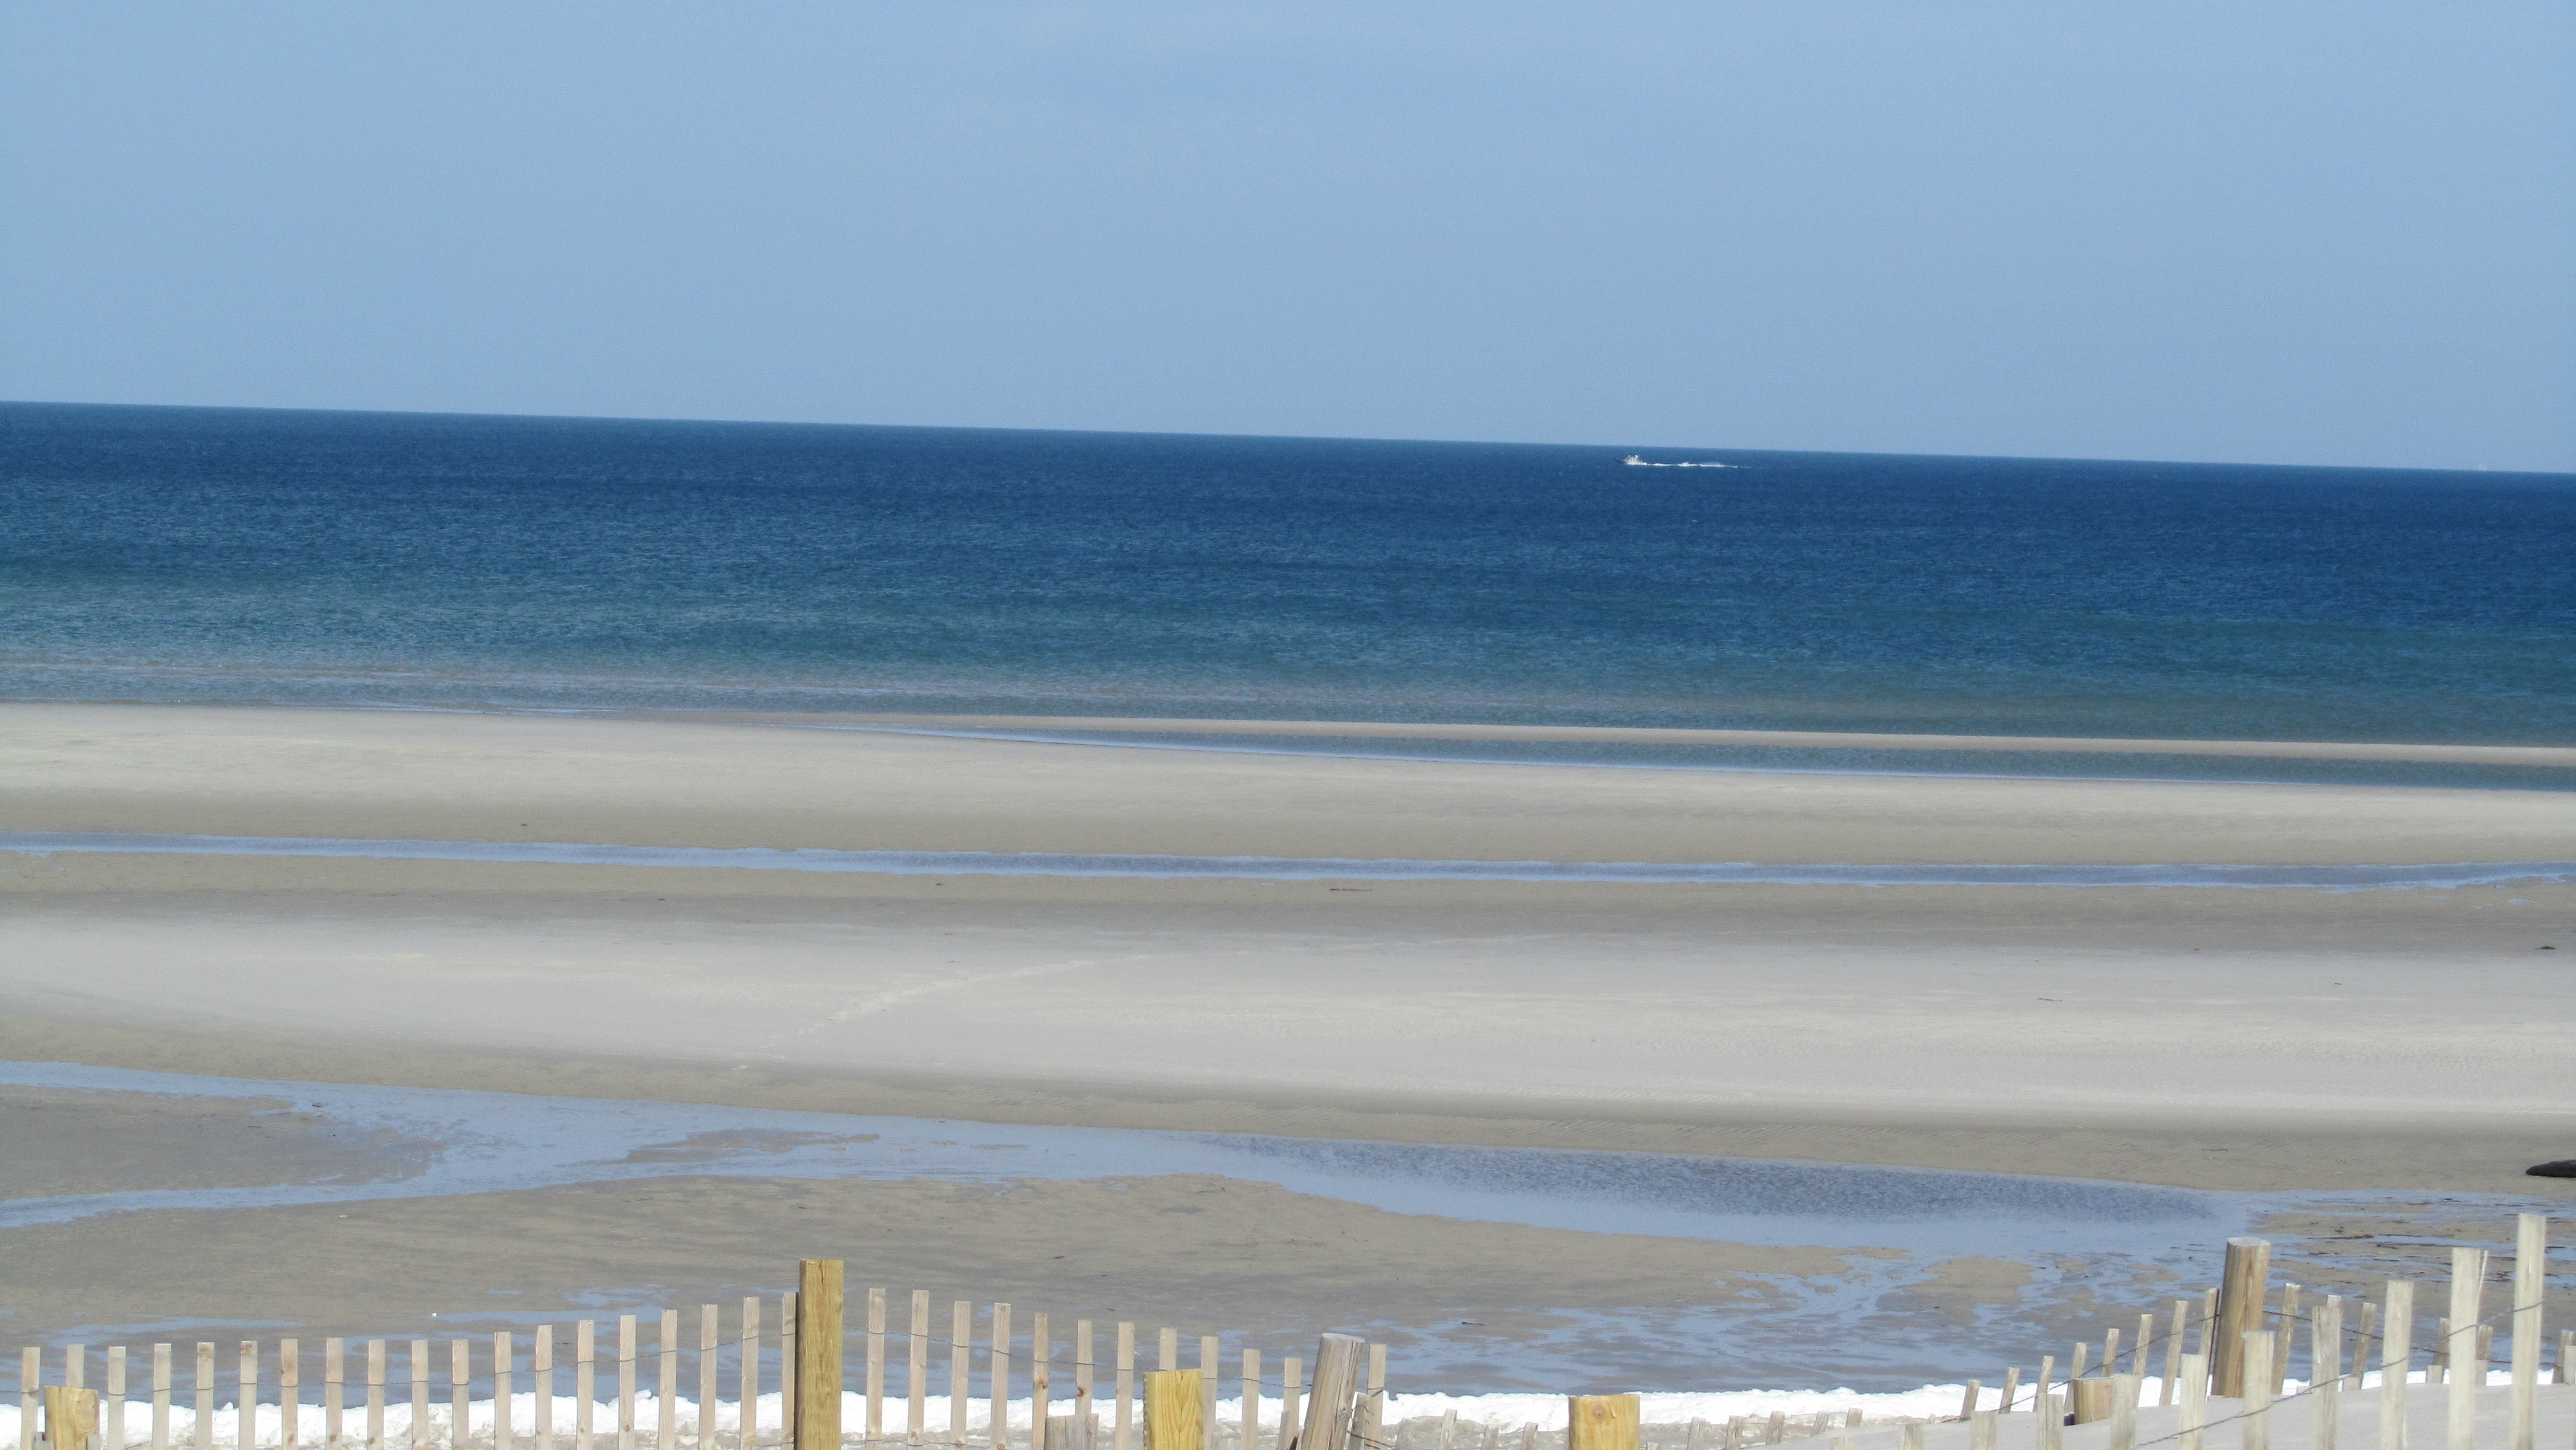 Exceptional Cape Cod Low Tide Part - 11: Mayflower Beach